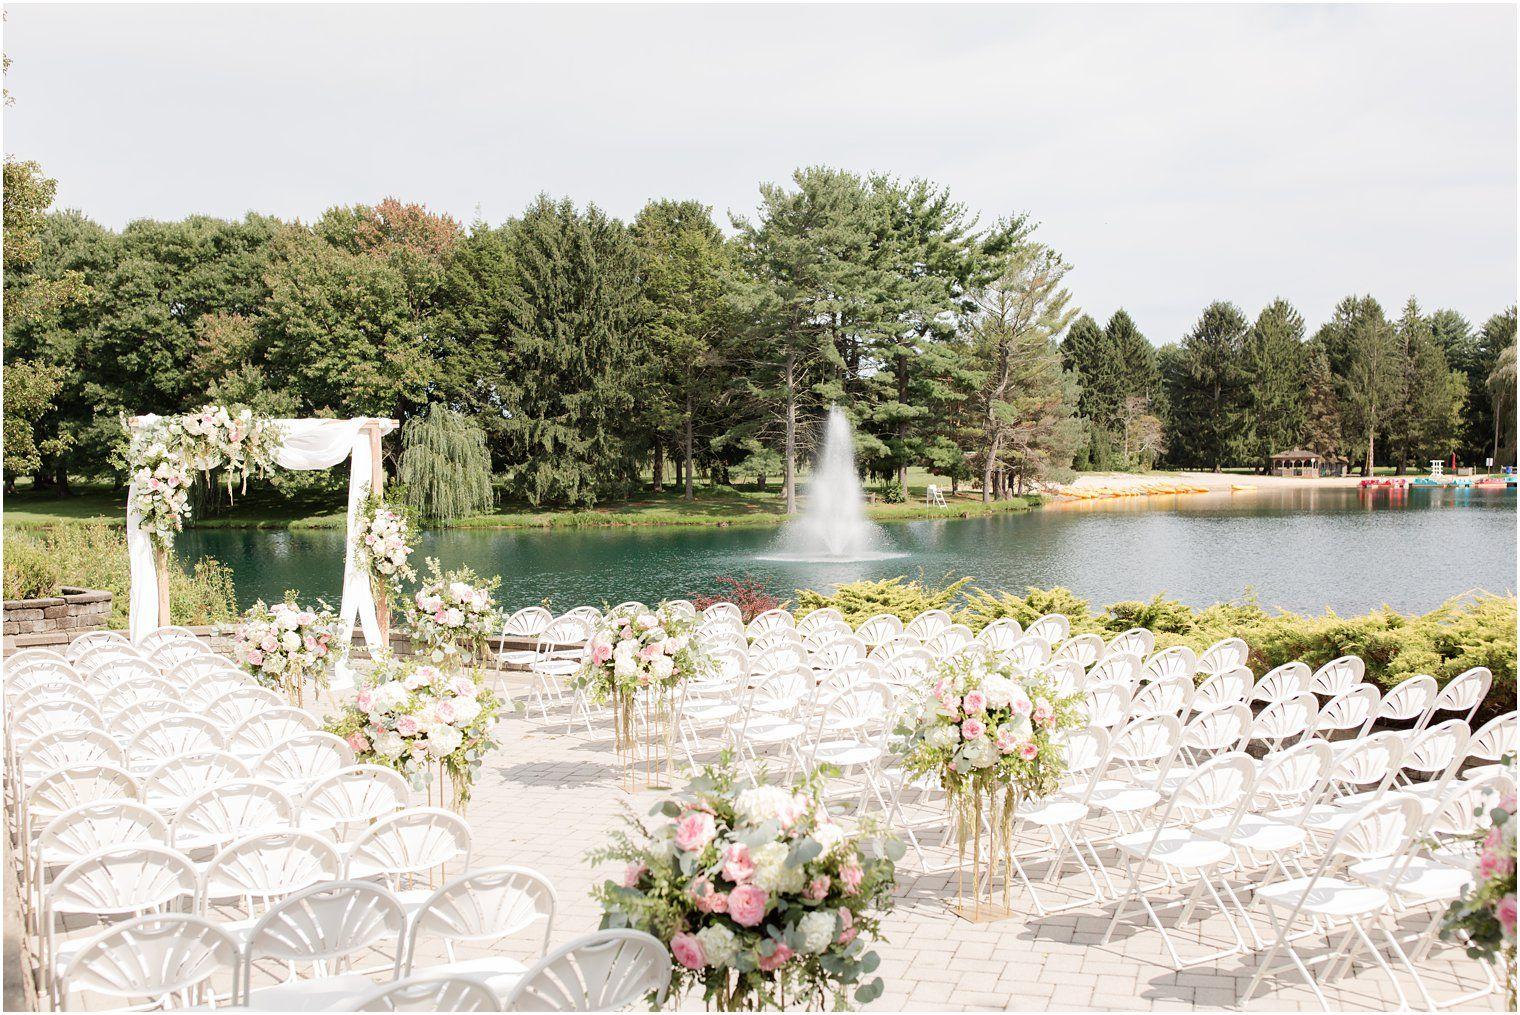 Outdoor Wedding Venues NJ Outdoor wedding venues, Nj